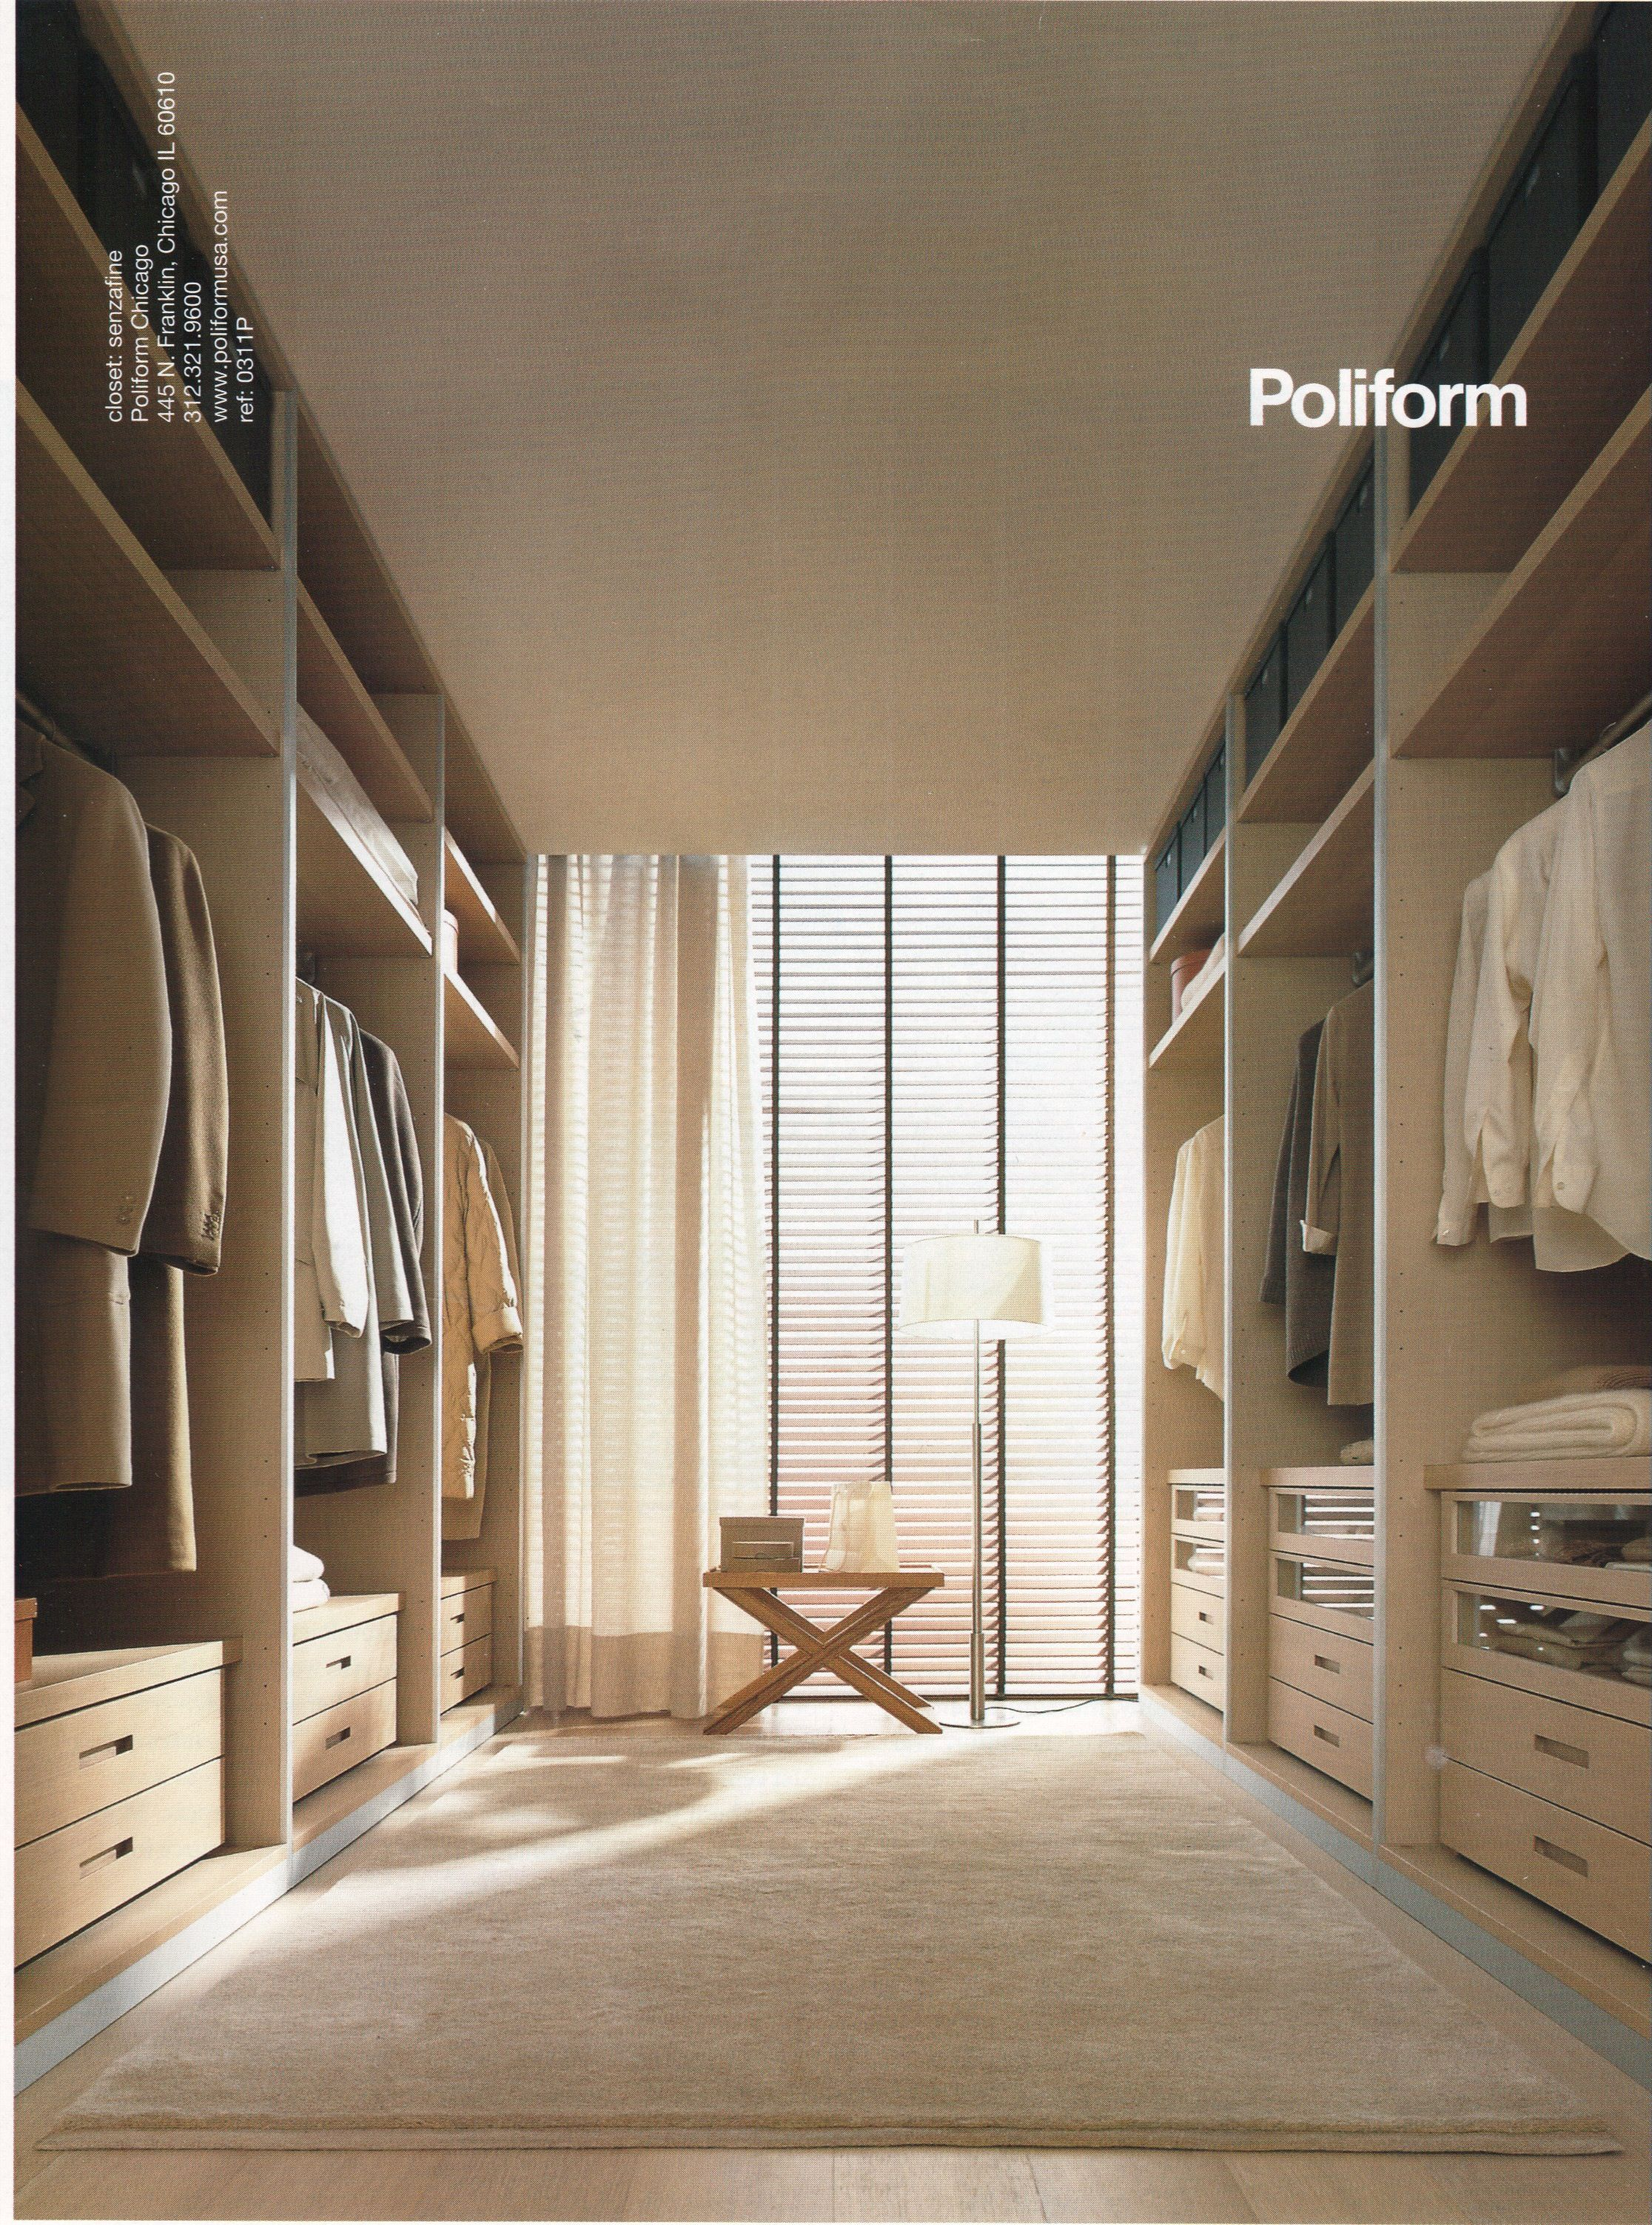 Charmant Poliform Closet